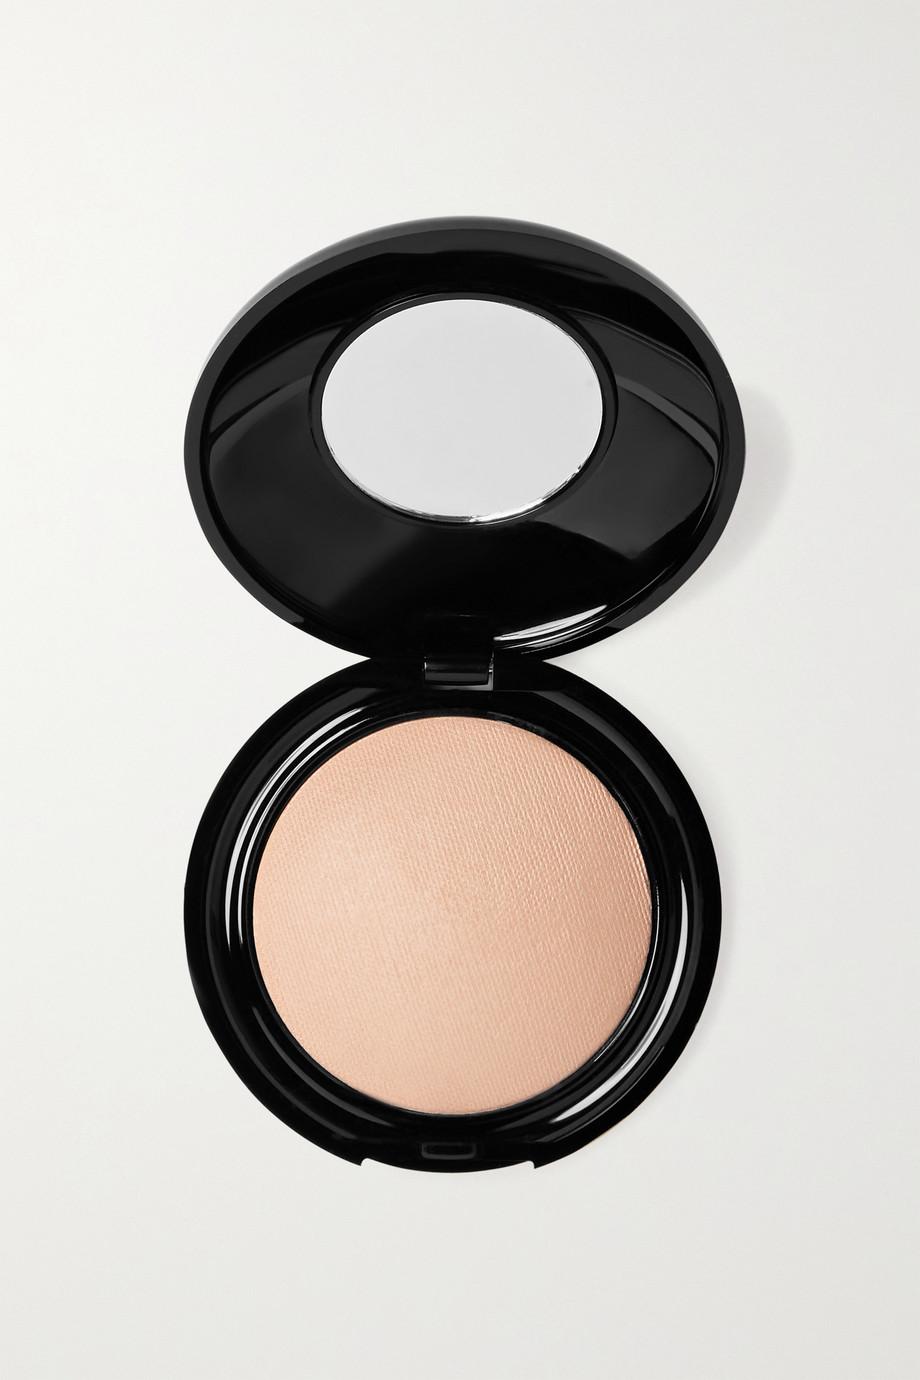 Pat McGrath Labs Skin Fetish: Sublime Perfection Blurring Under-Eye Powder - Yellow